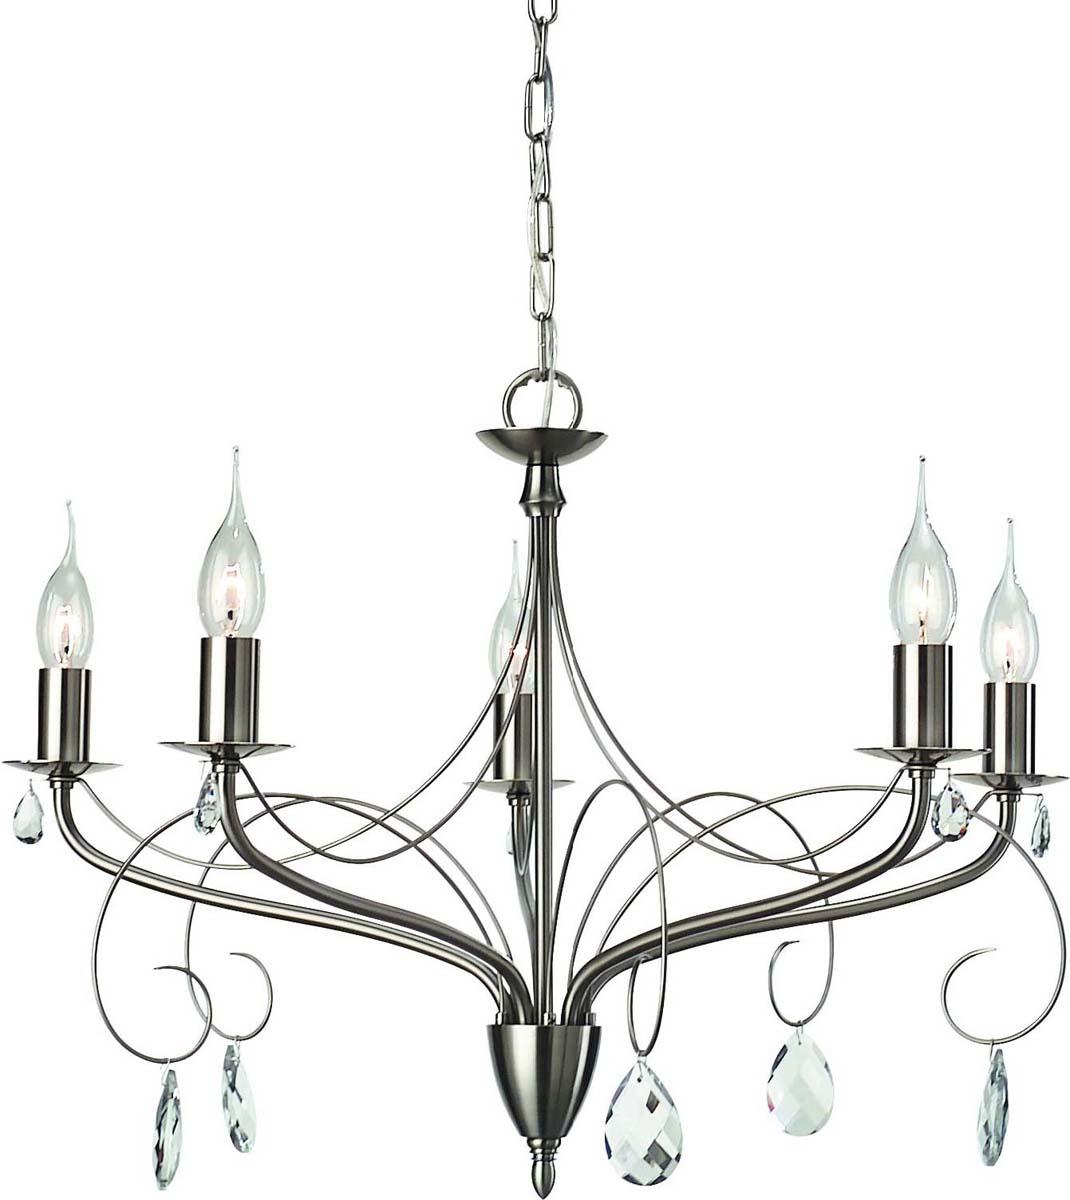 Светильник подвесной Arte Lamp Purezza, 5 х E14, 40 W. A6645LM-5SS люстра на штанге arte lamp cloud a8170pl 5ss